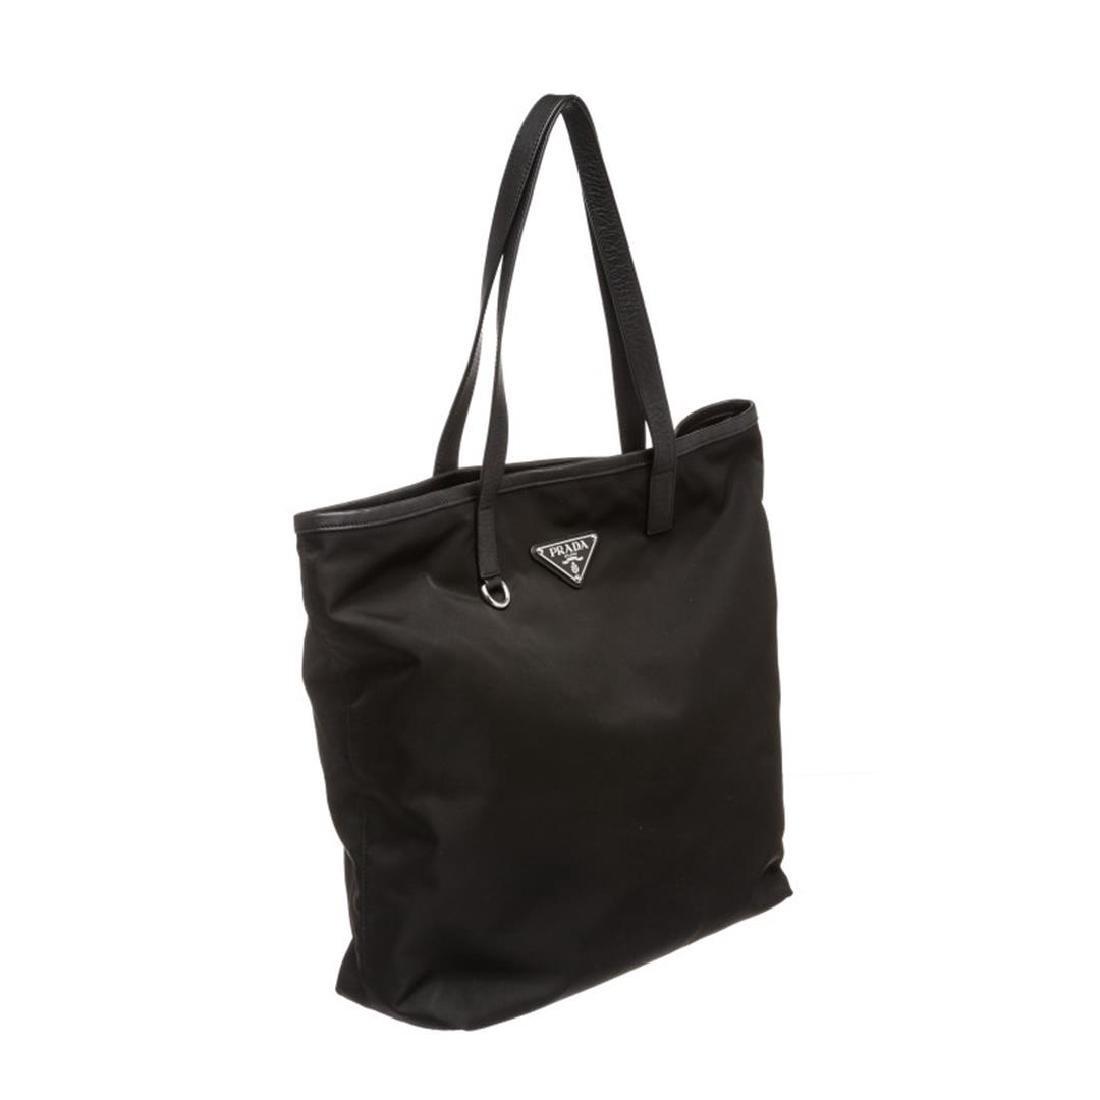 Prada Black Nylon Leather Long Tote Shoulder Bag - 2